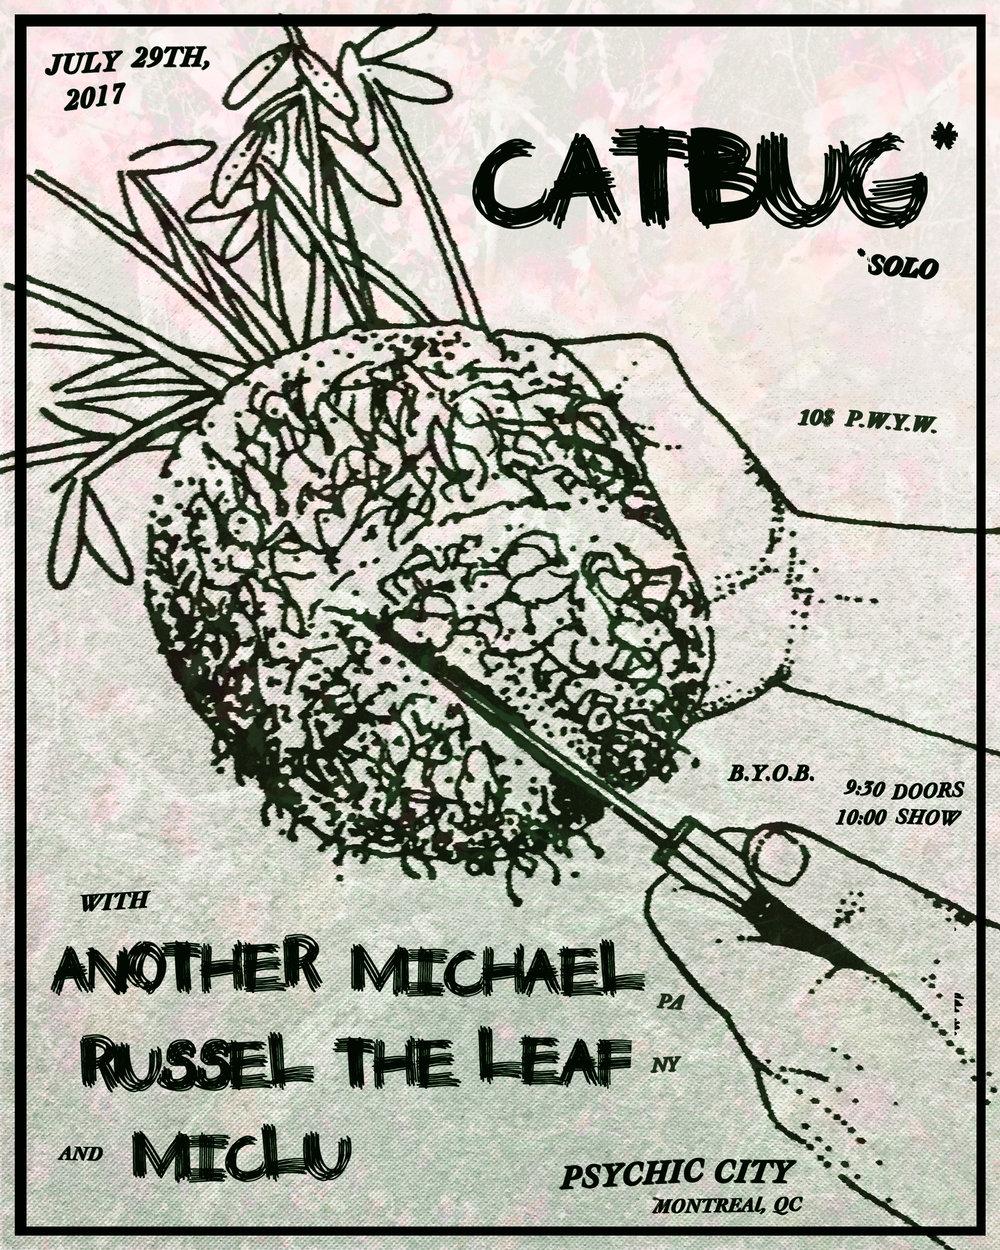 Flyer-Catbug729-RusselFixed copy.jpg